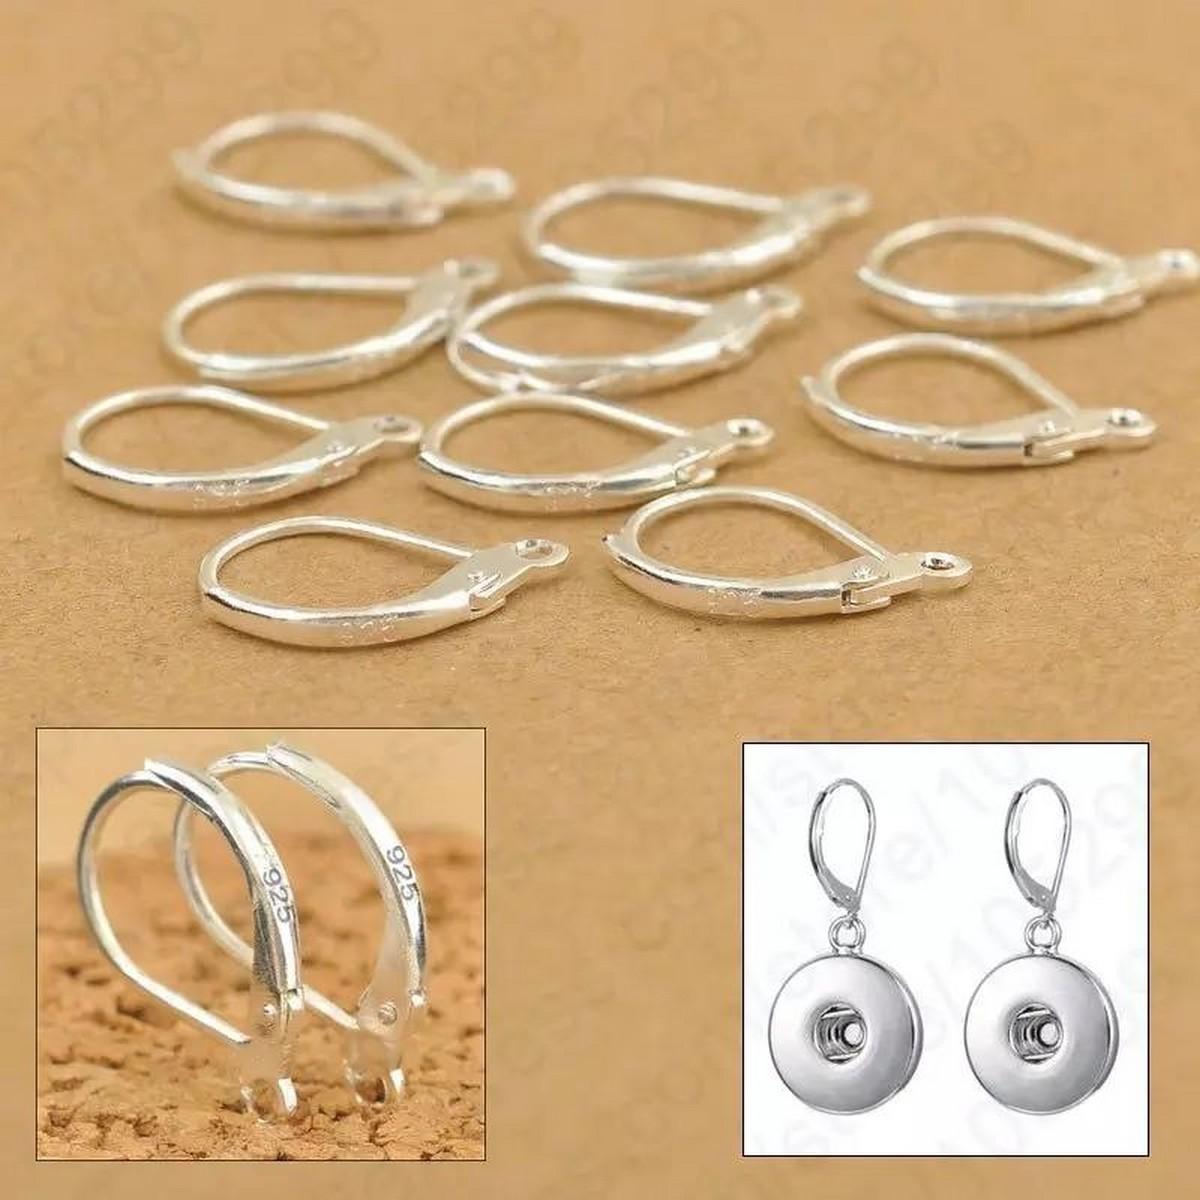 10pairs Jewellery Components 925 Sterling Silver Handmade Diy Beadings Findings Earring Hooks Leverback Earwire Fittings